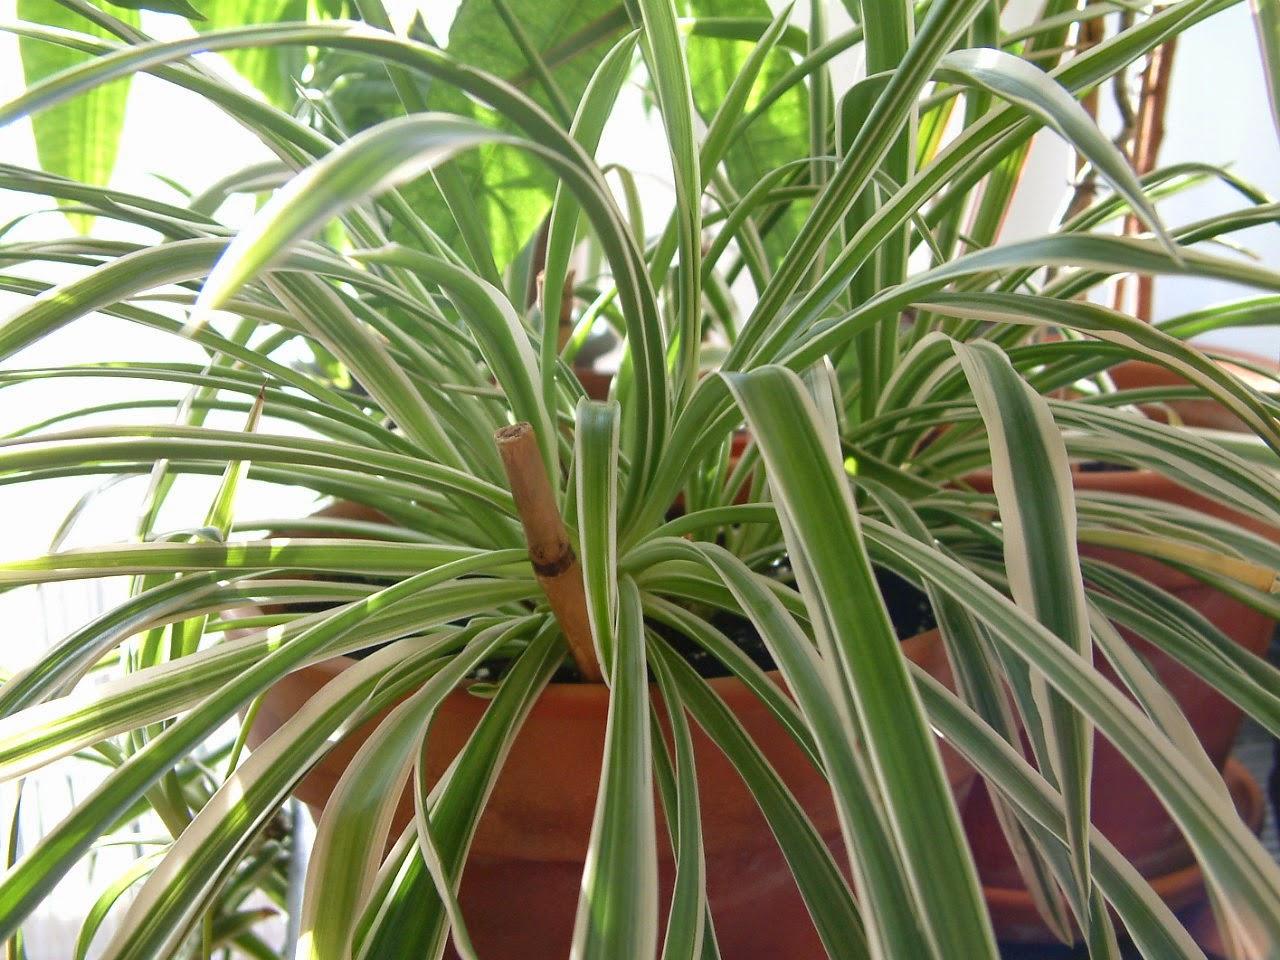 Clorofito - Plantas de interior